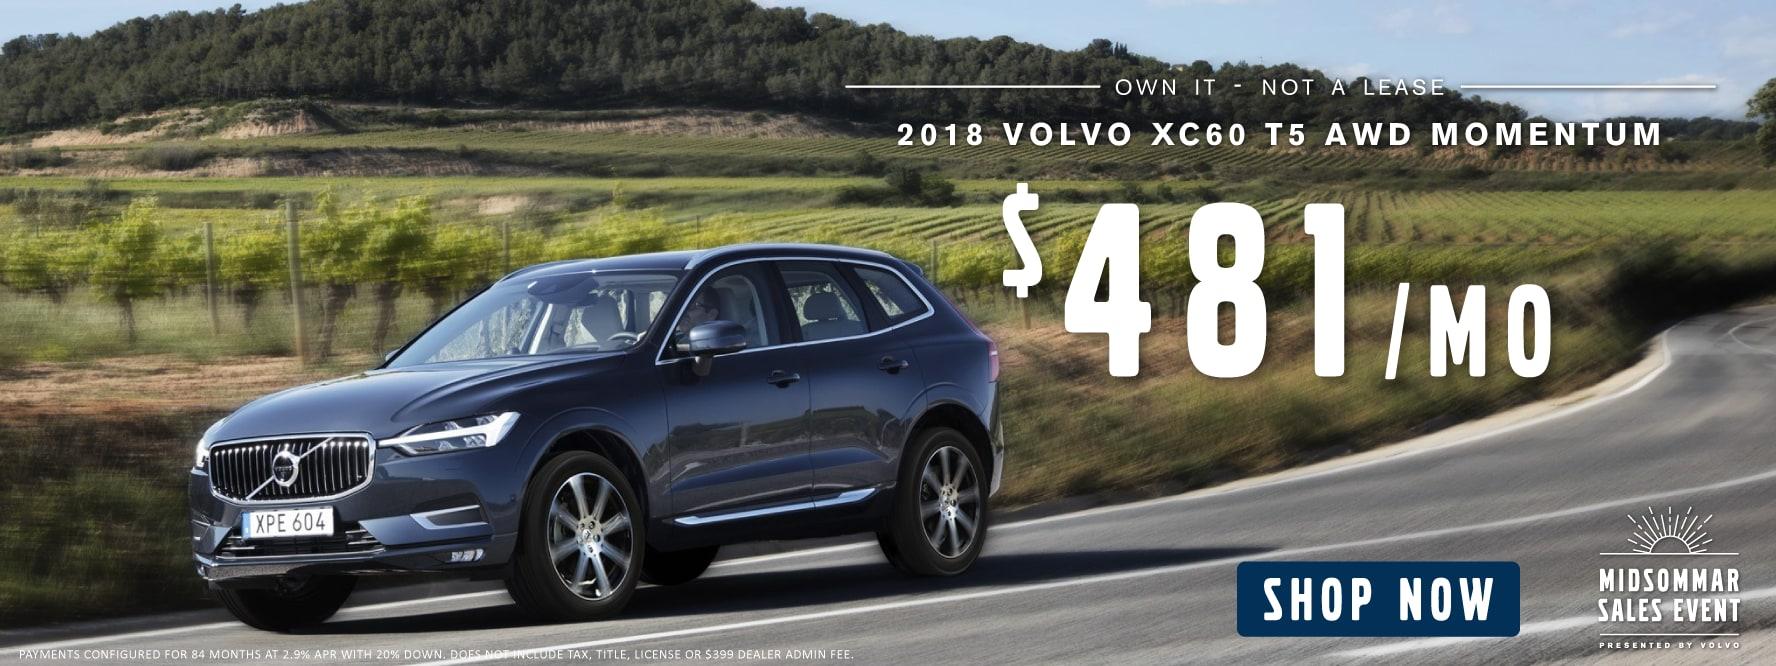 New Volvo & Used Car Dealer Wichita | Eddy's Volvo Cars of Wichita